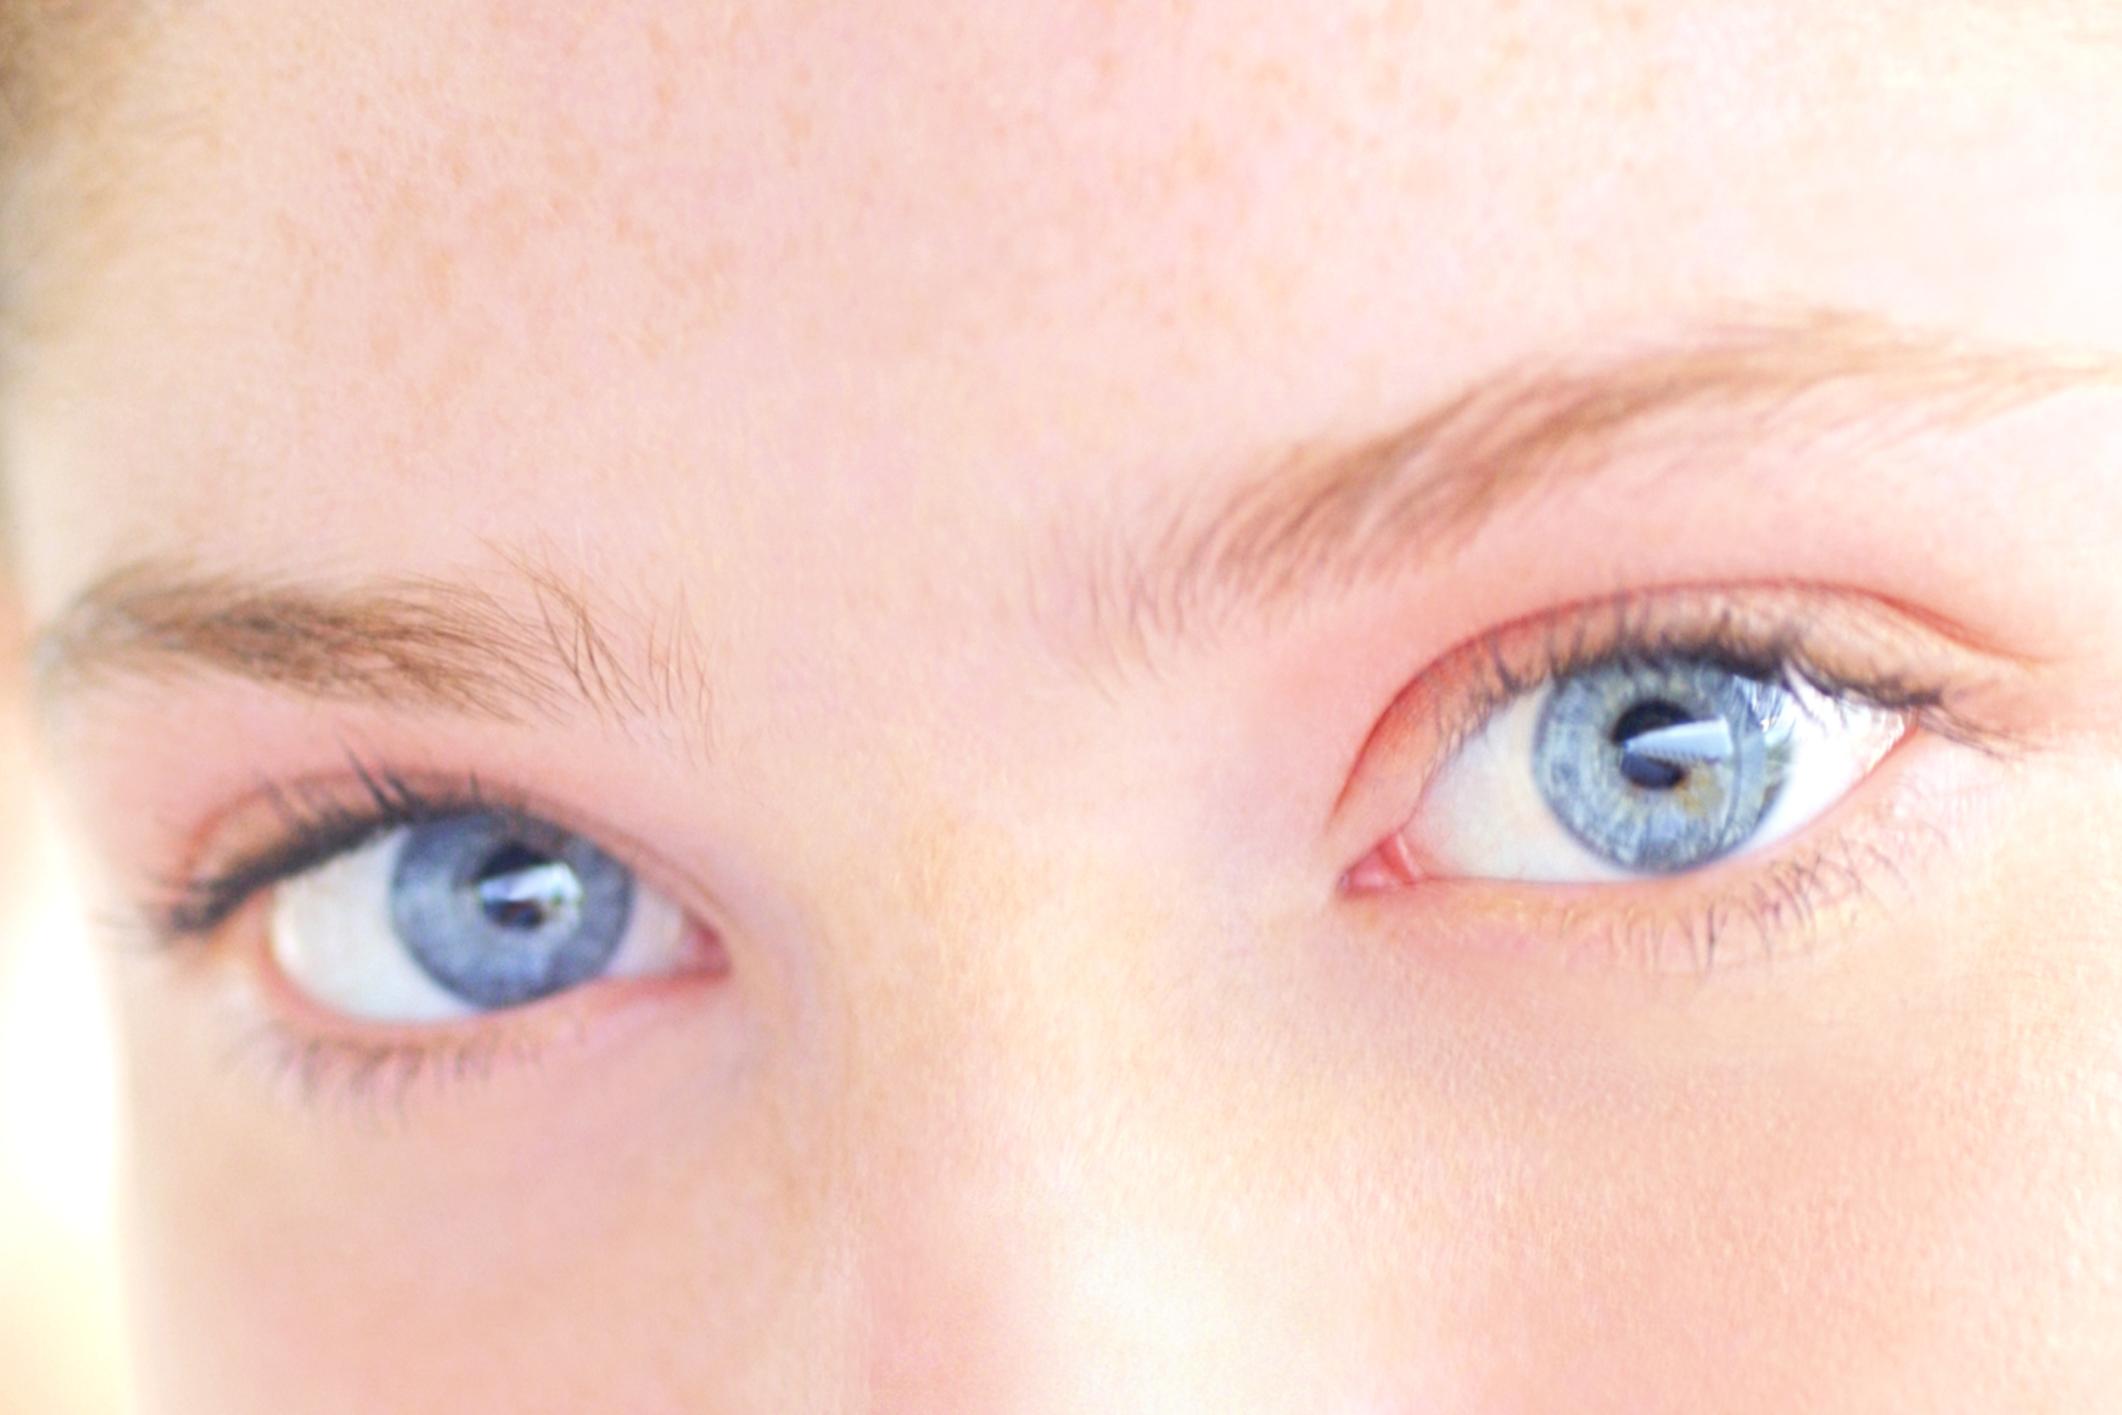 White Line on Nose in Children